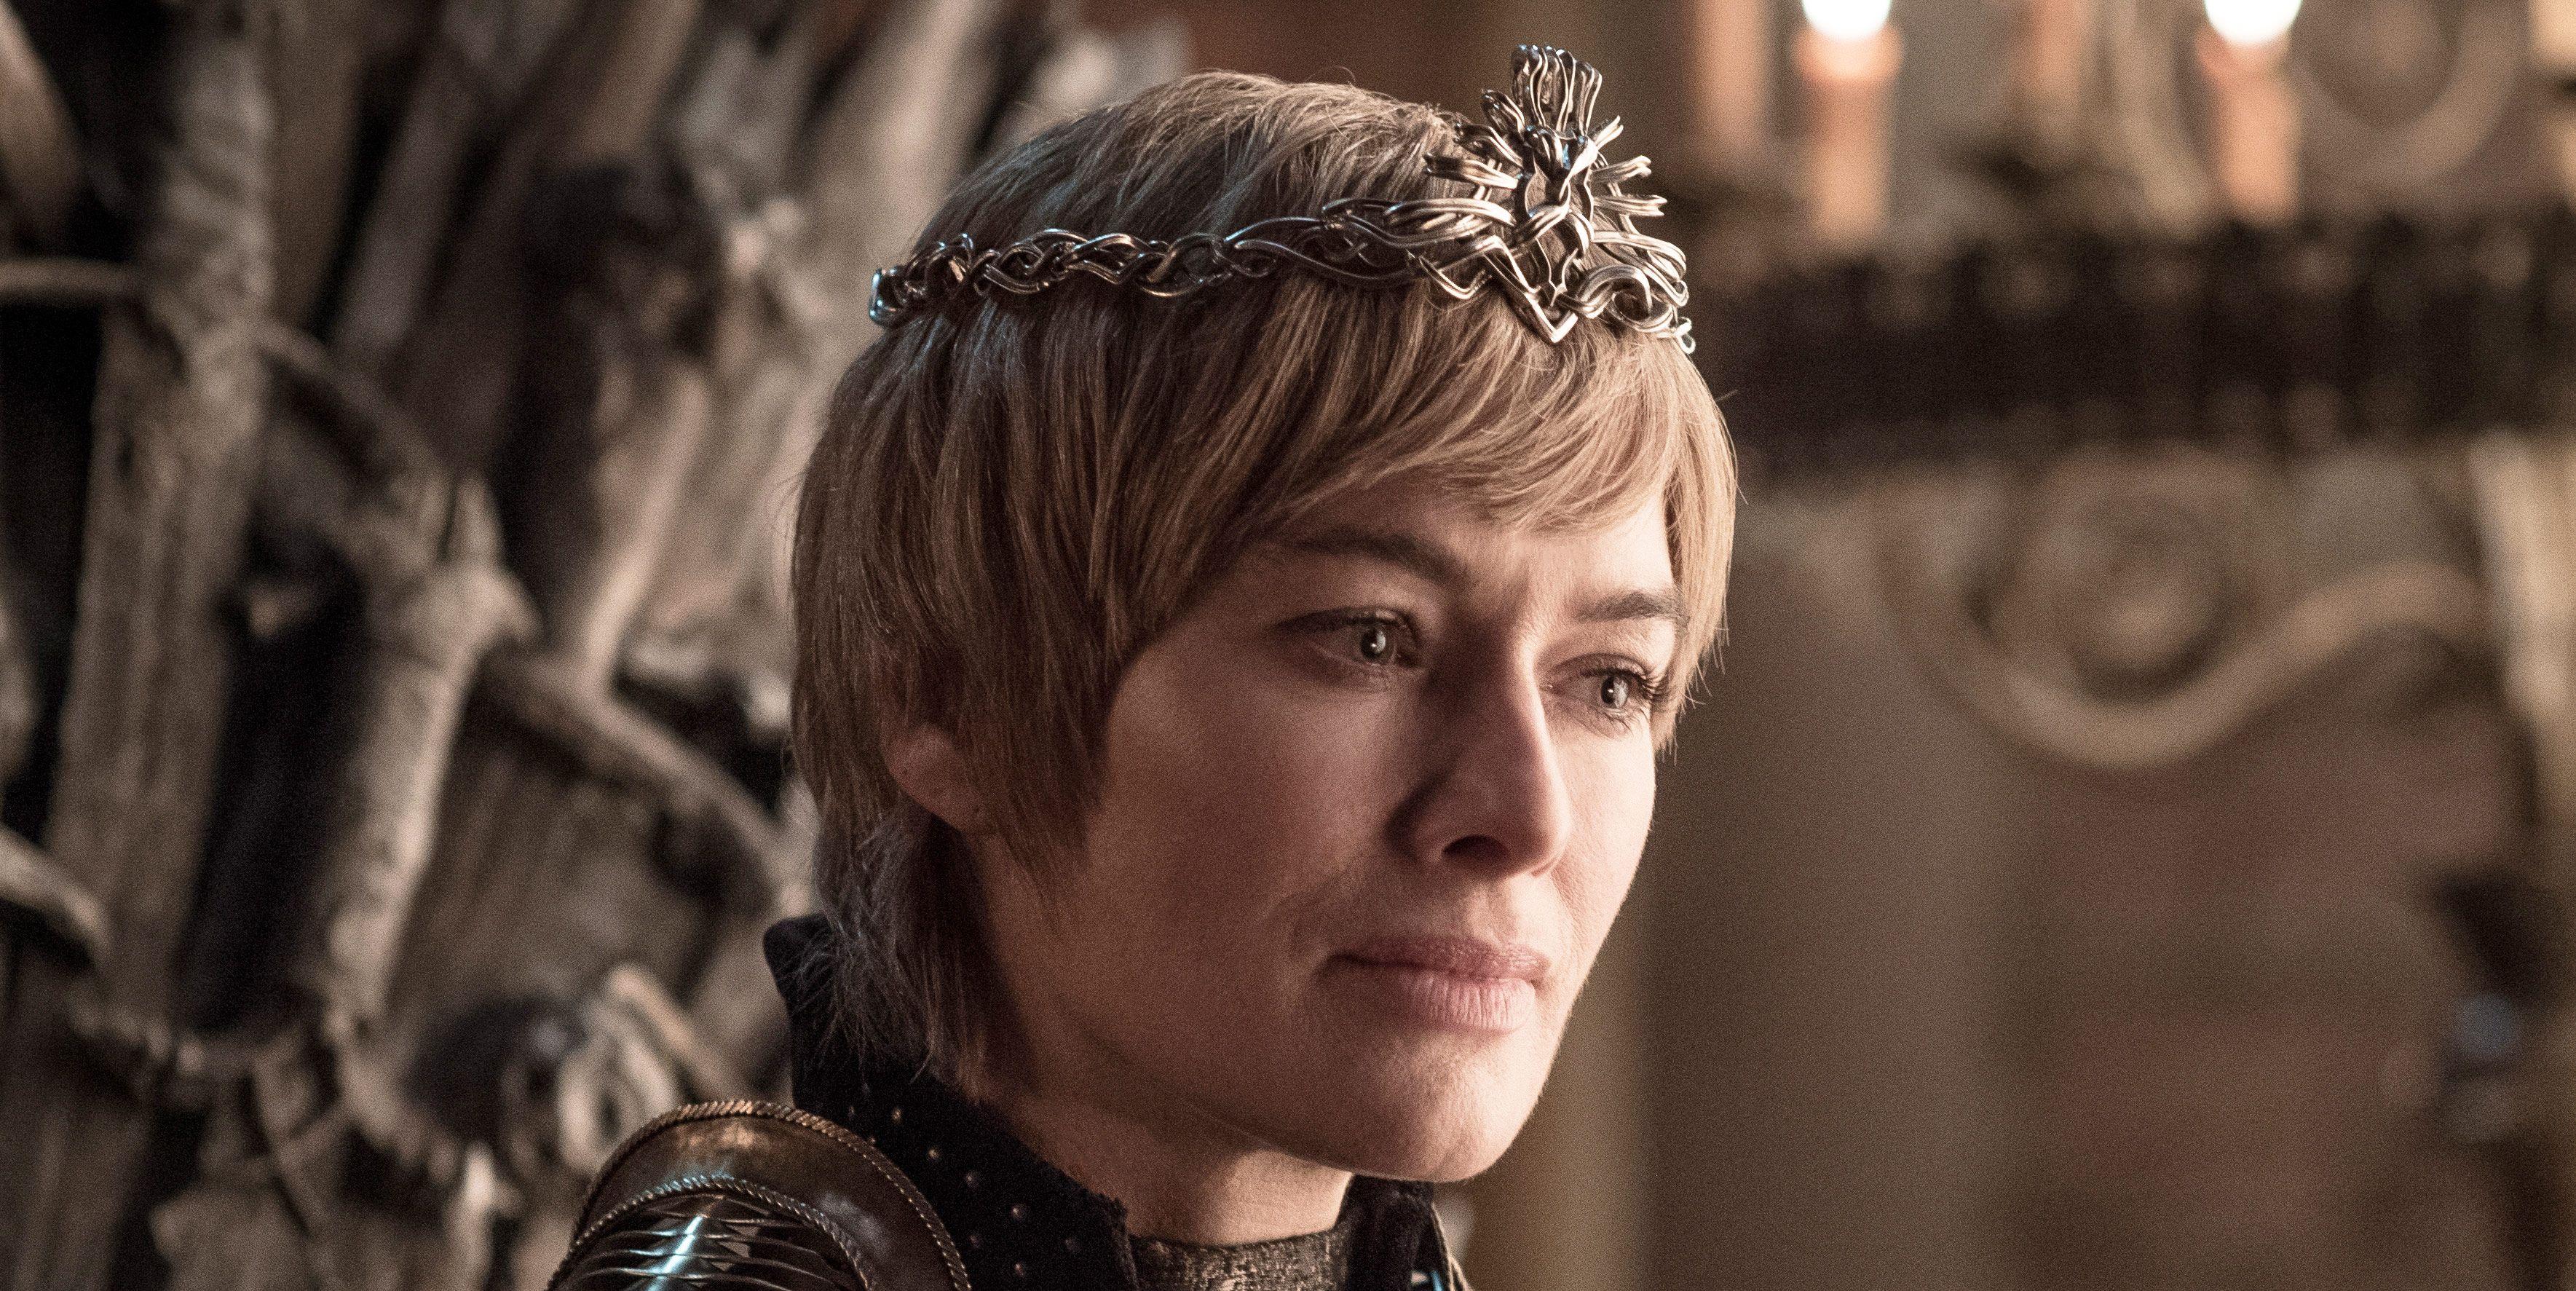 Game of Thrones, Season 8, Lena Headey, Cersei Lannister